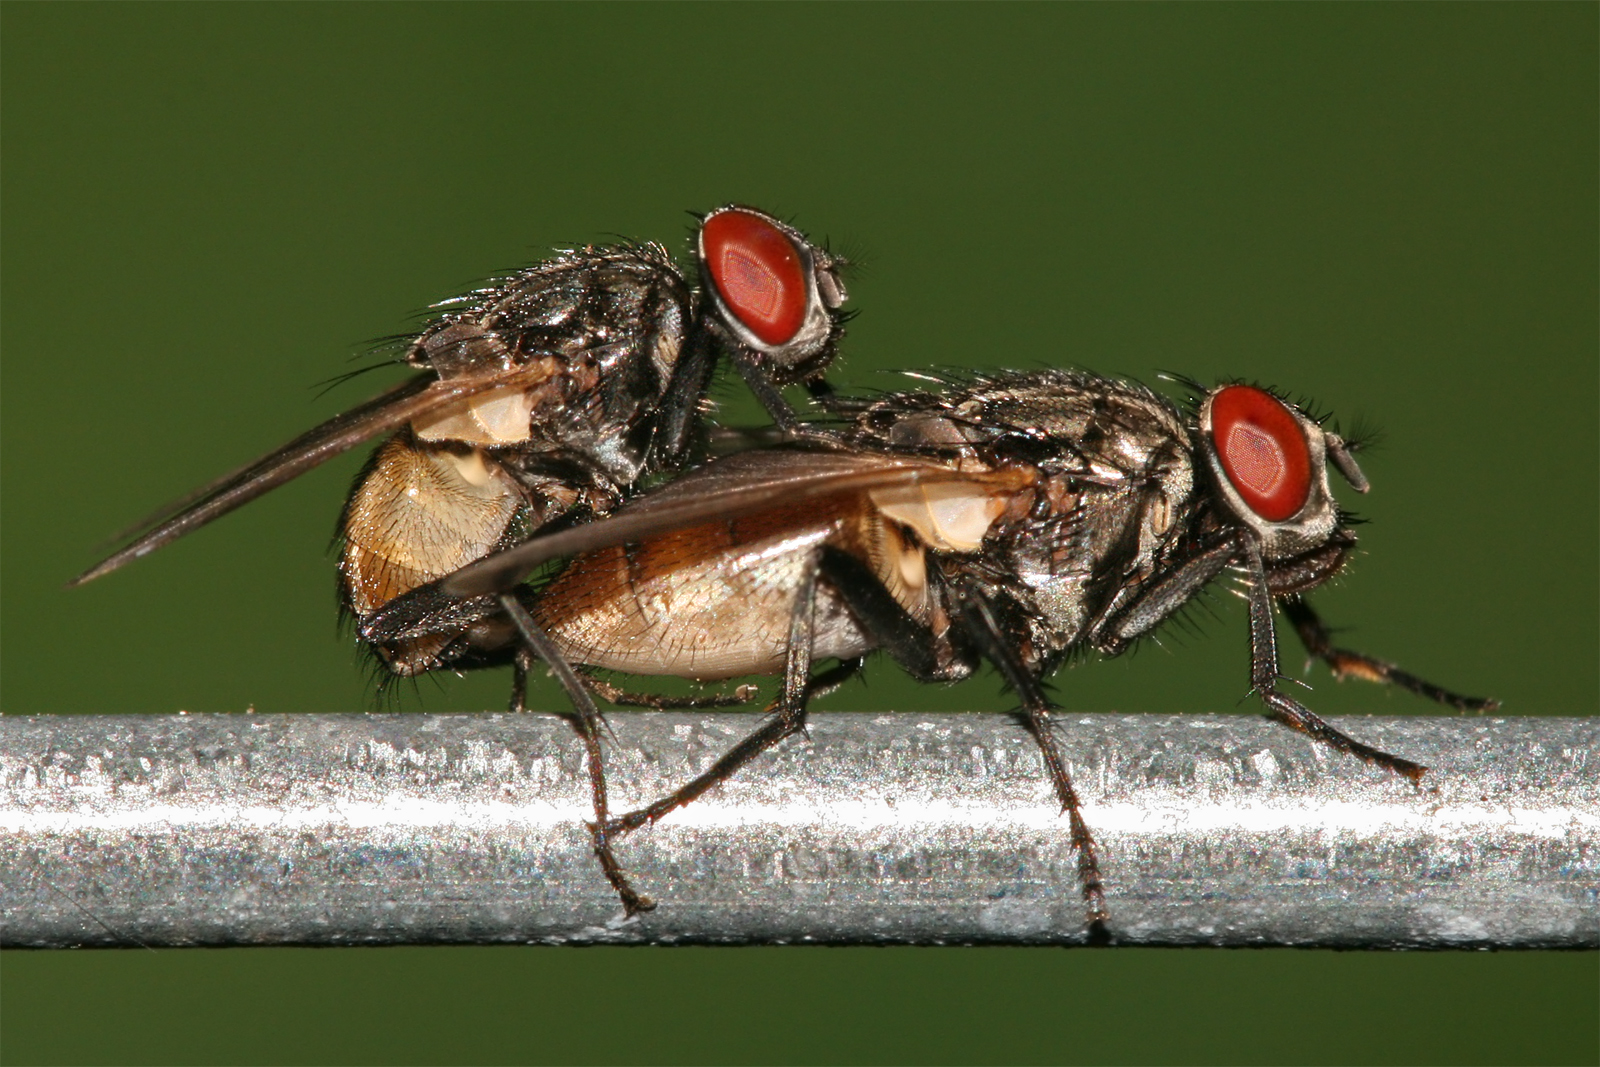 https://upload.wikimedia.org/wikipedia/commons/2/29/Housefly_mating.jpg